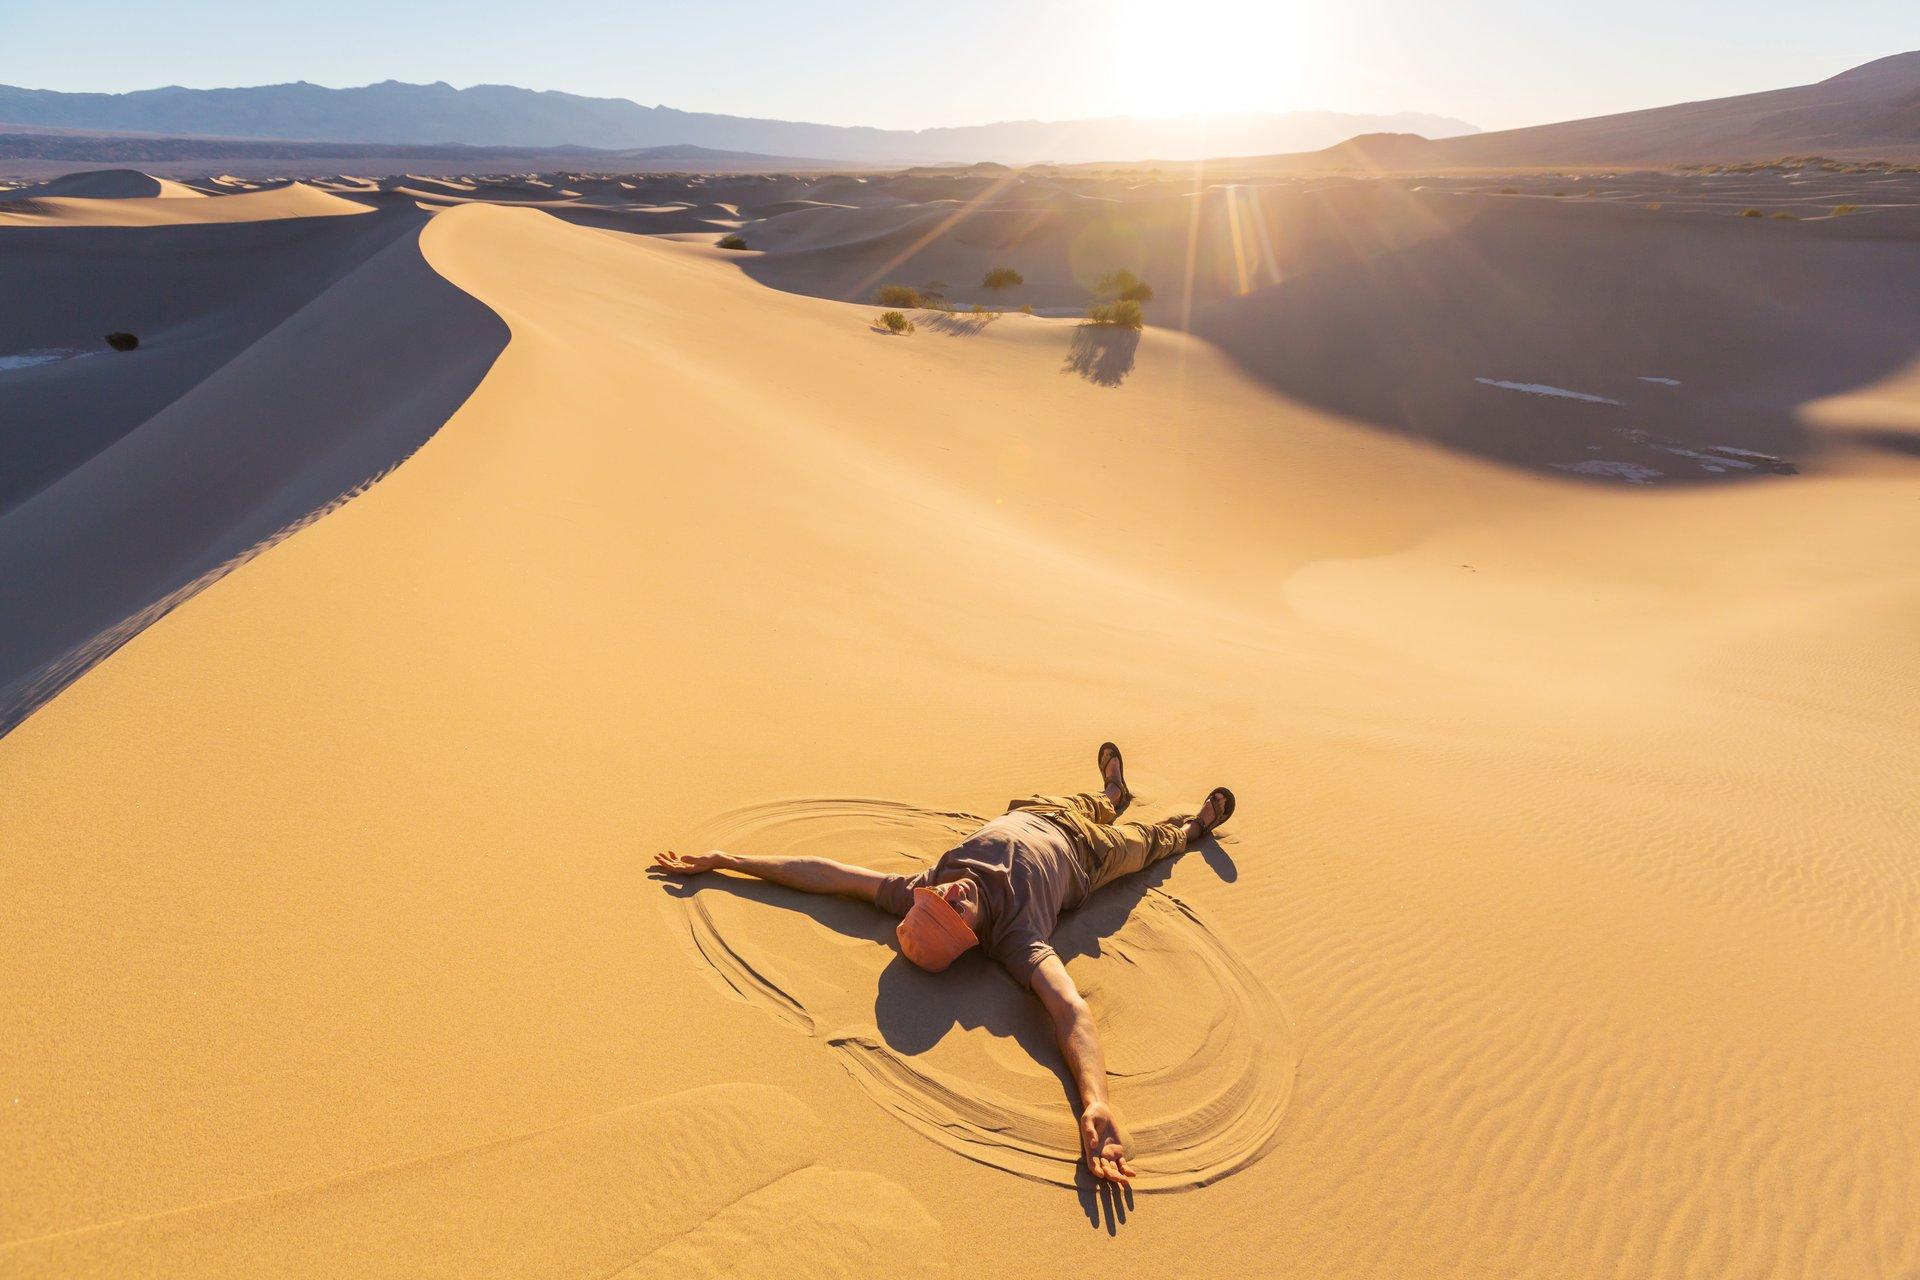 Man lying on sand dune